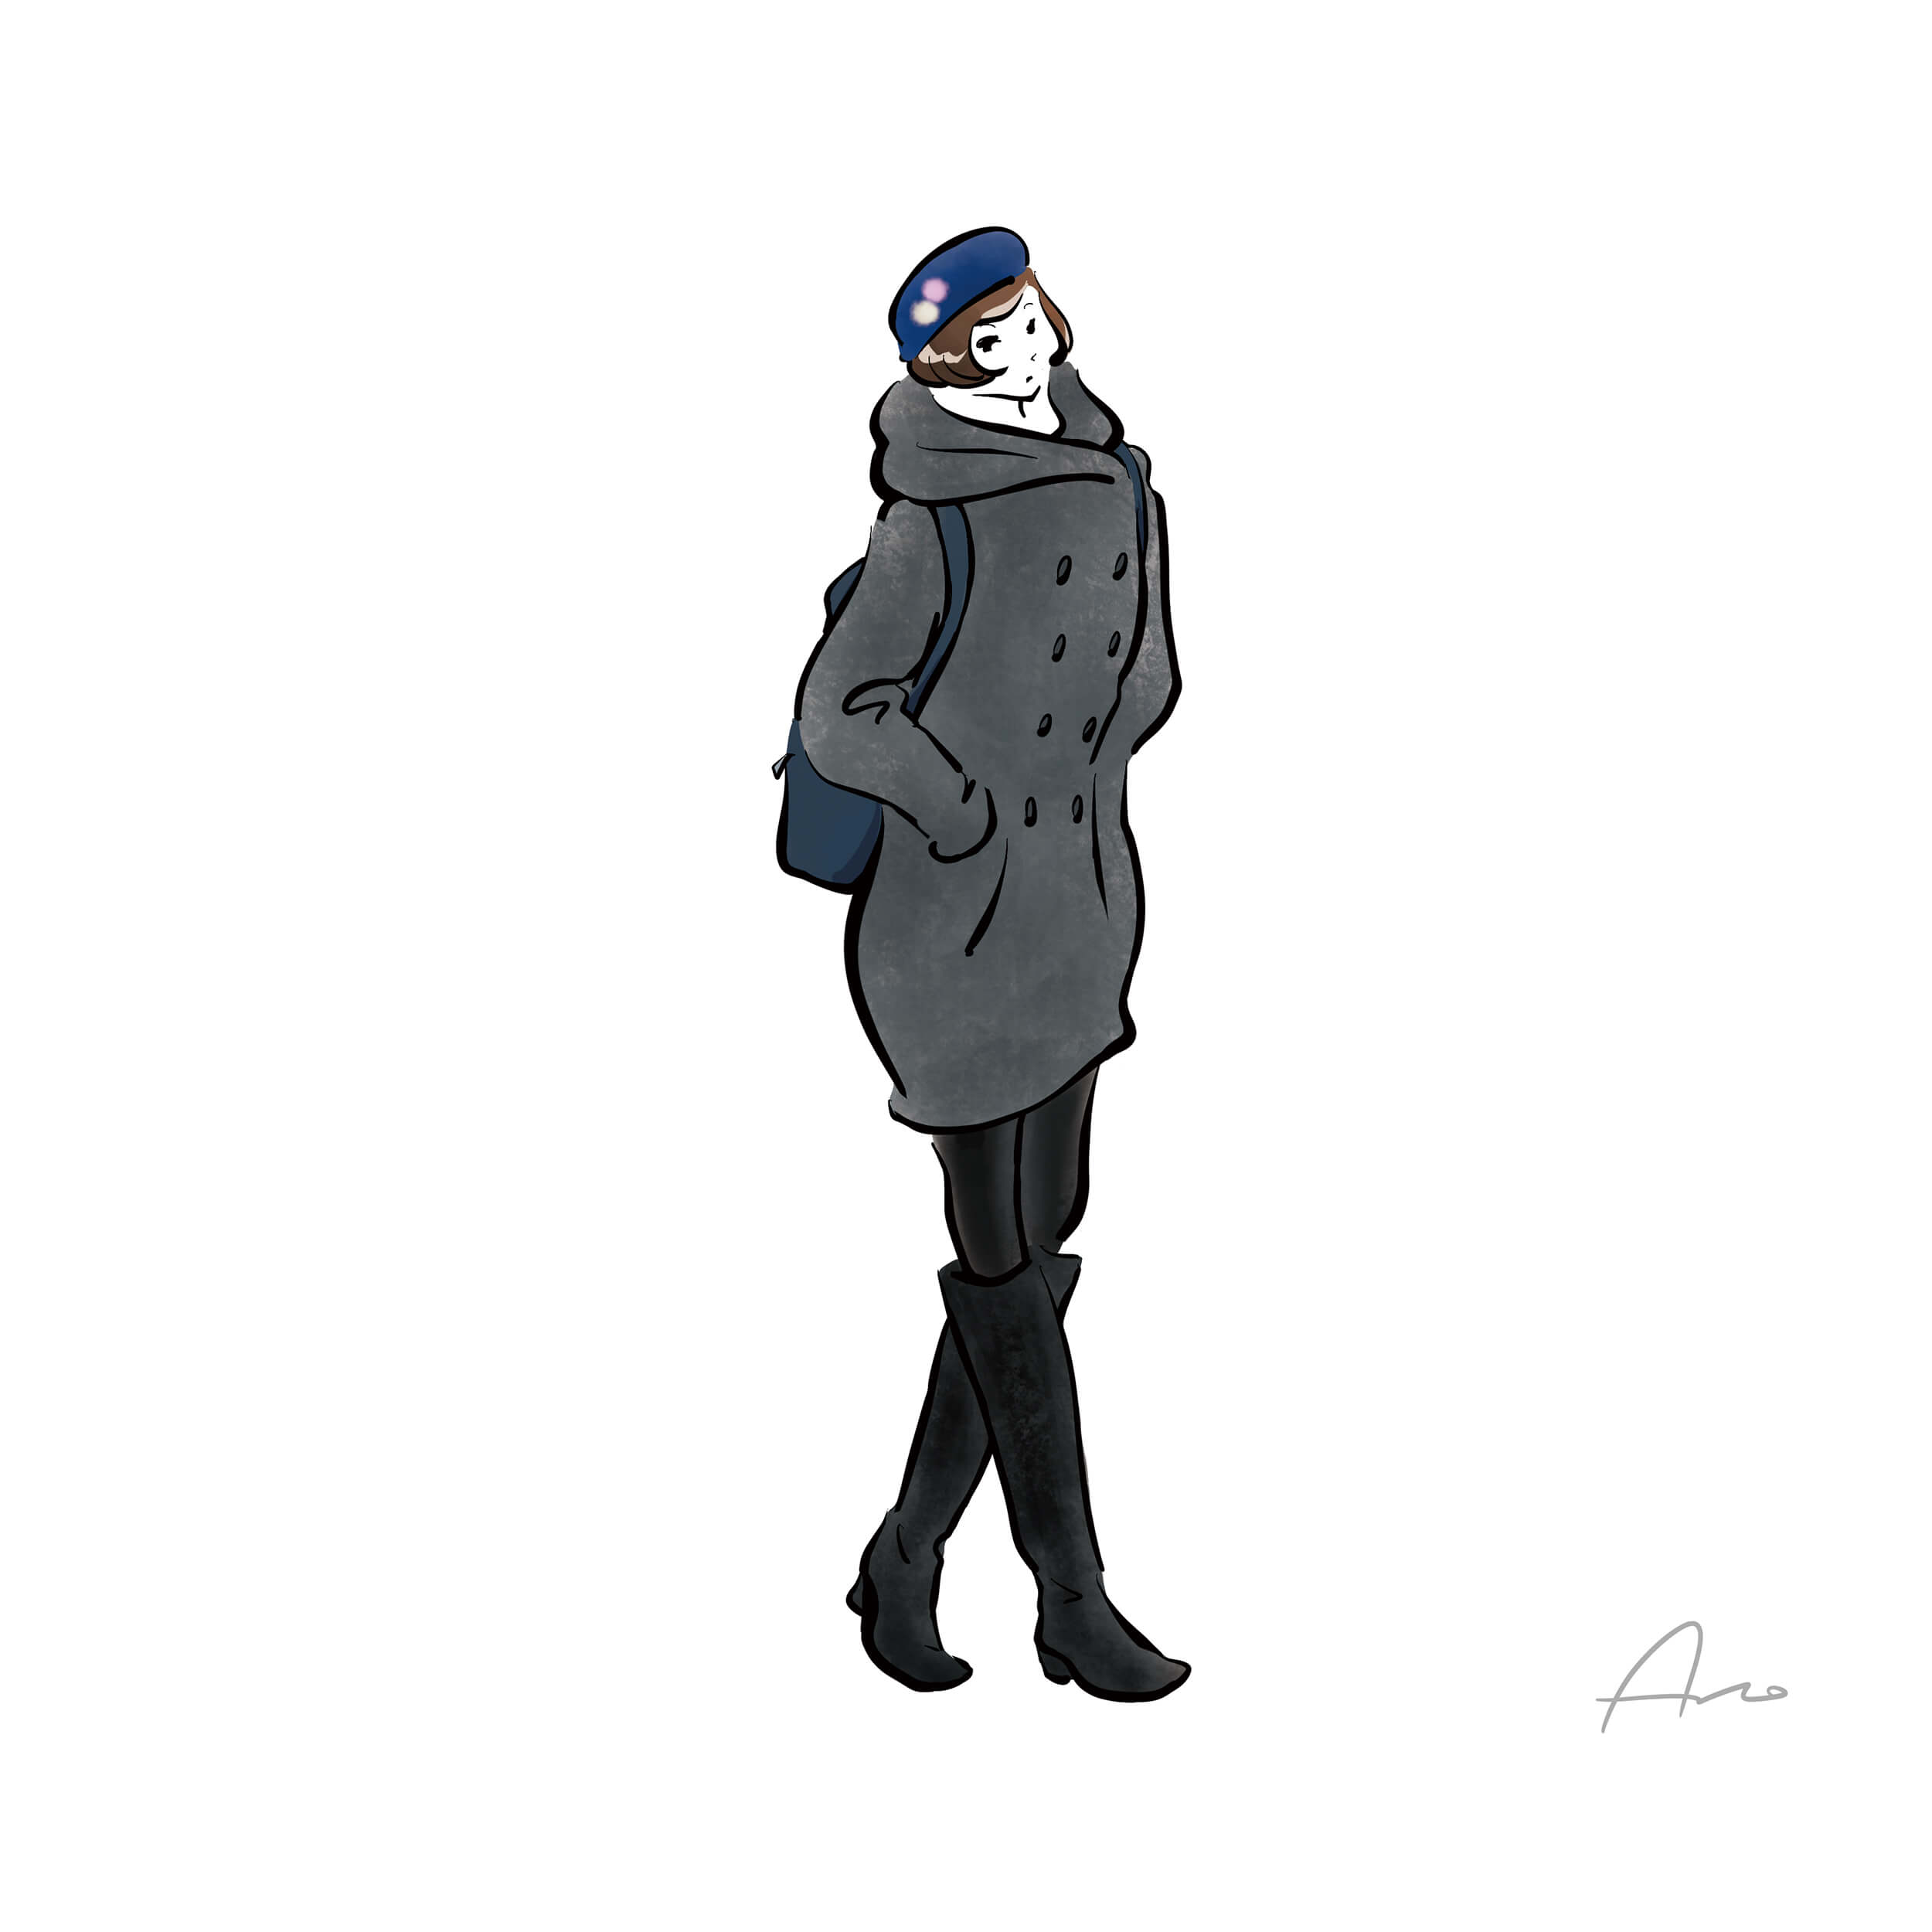 2017 01 29